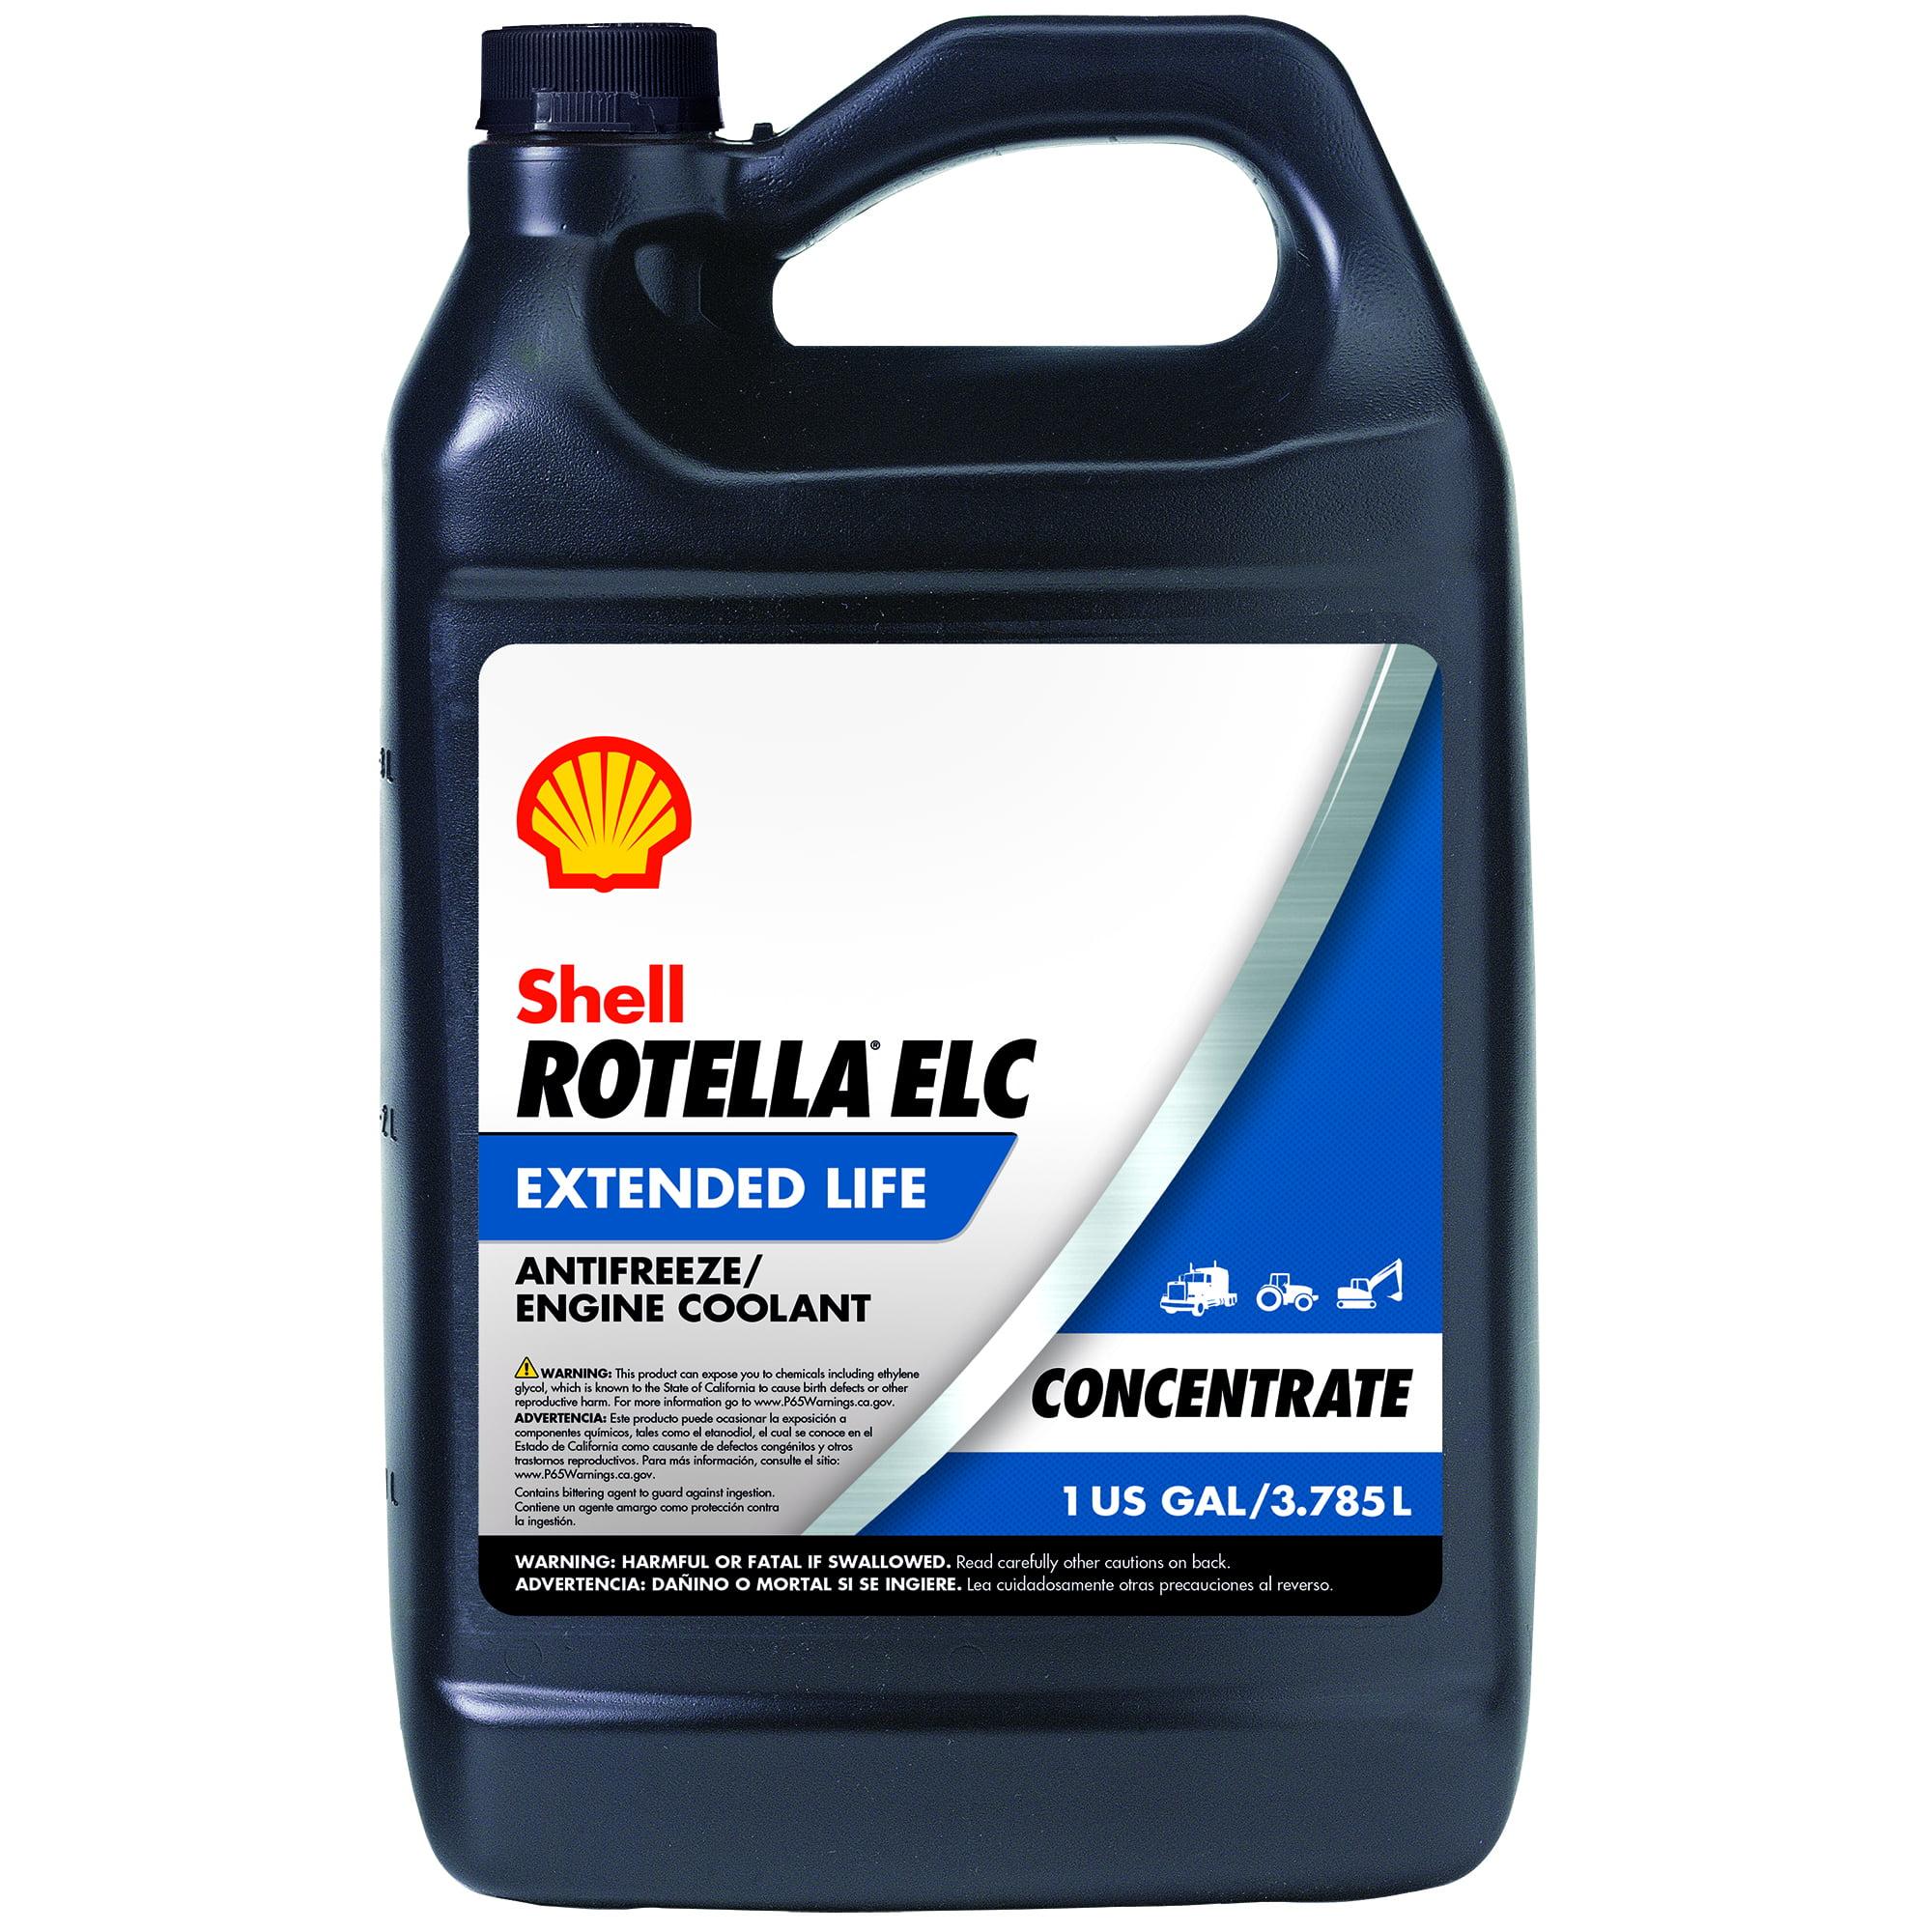 Shell Rotella ELC Antifreeze Concentrate ,1 Gallon